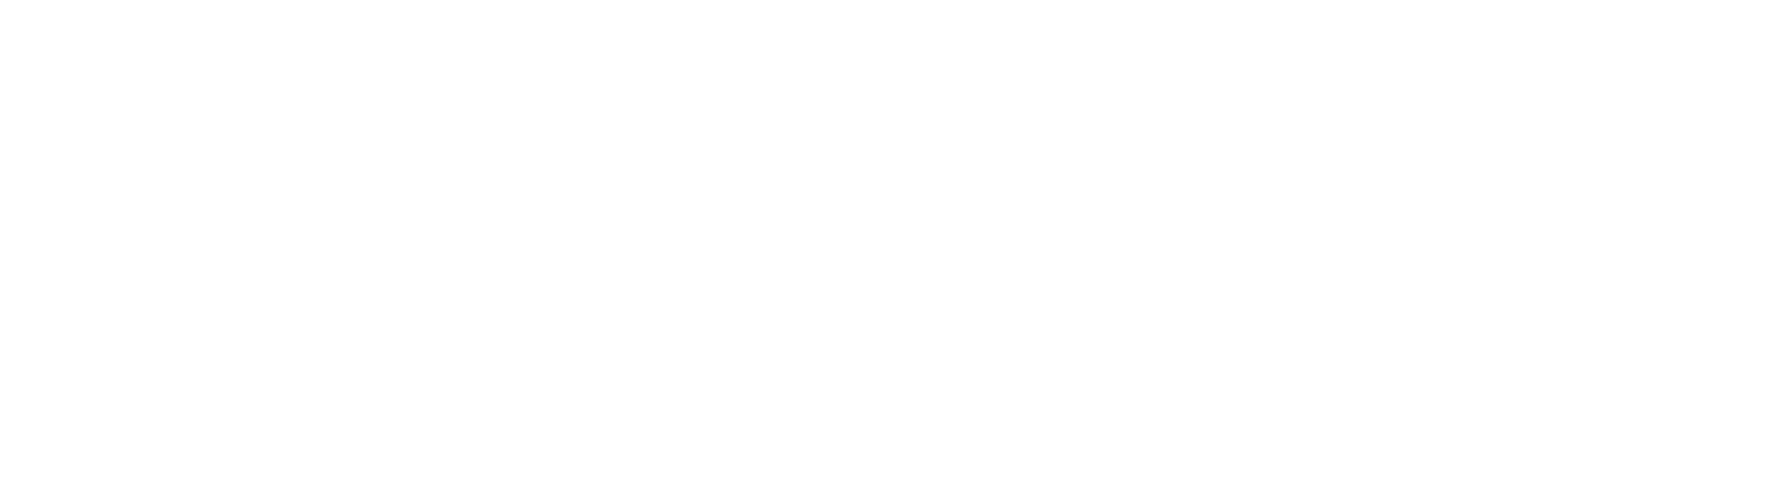 Logo 1doc3 blanco